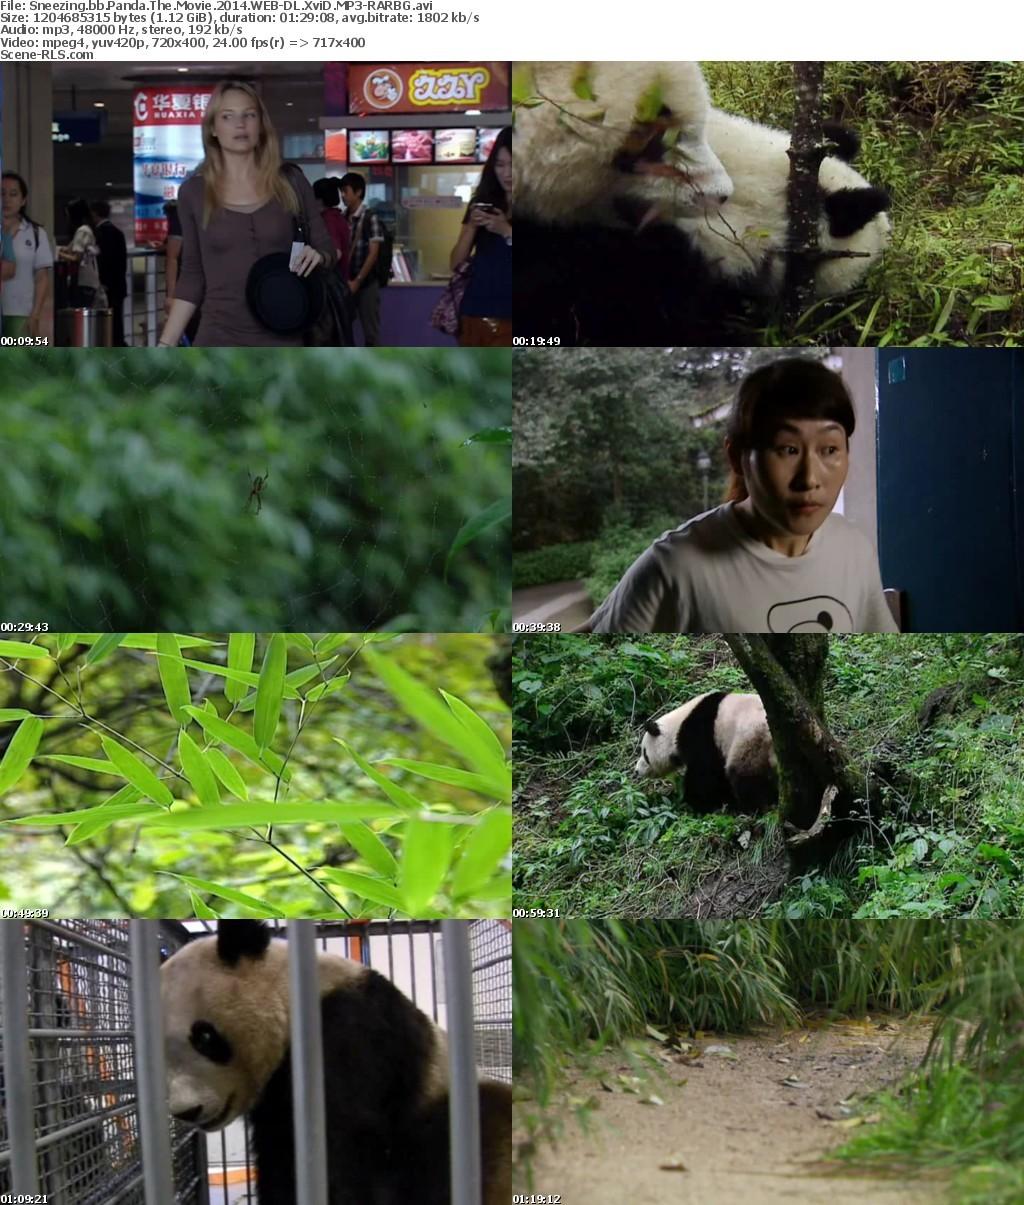 sneezing-baby-panda q .jpg